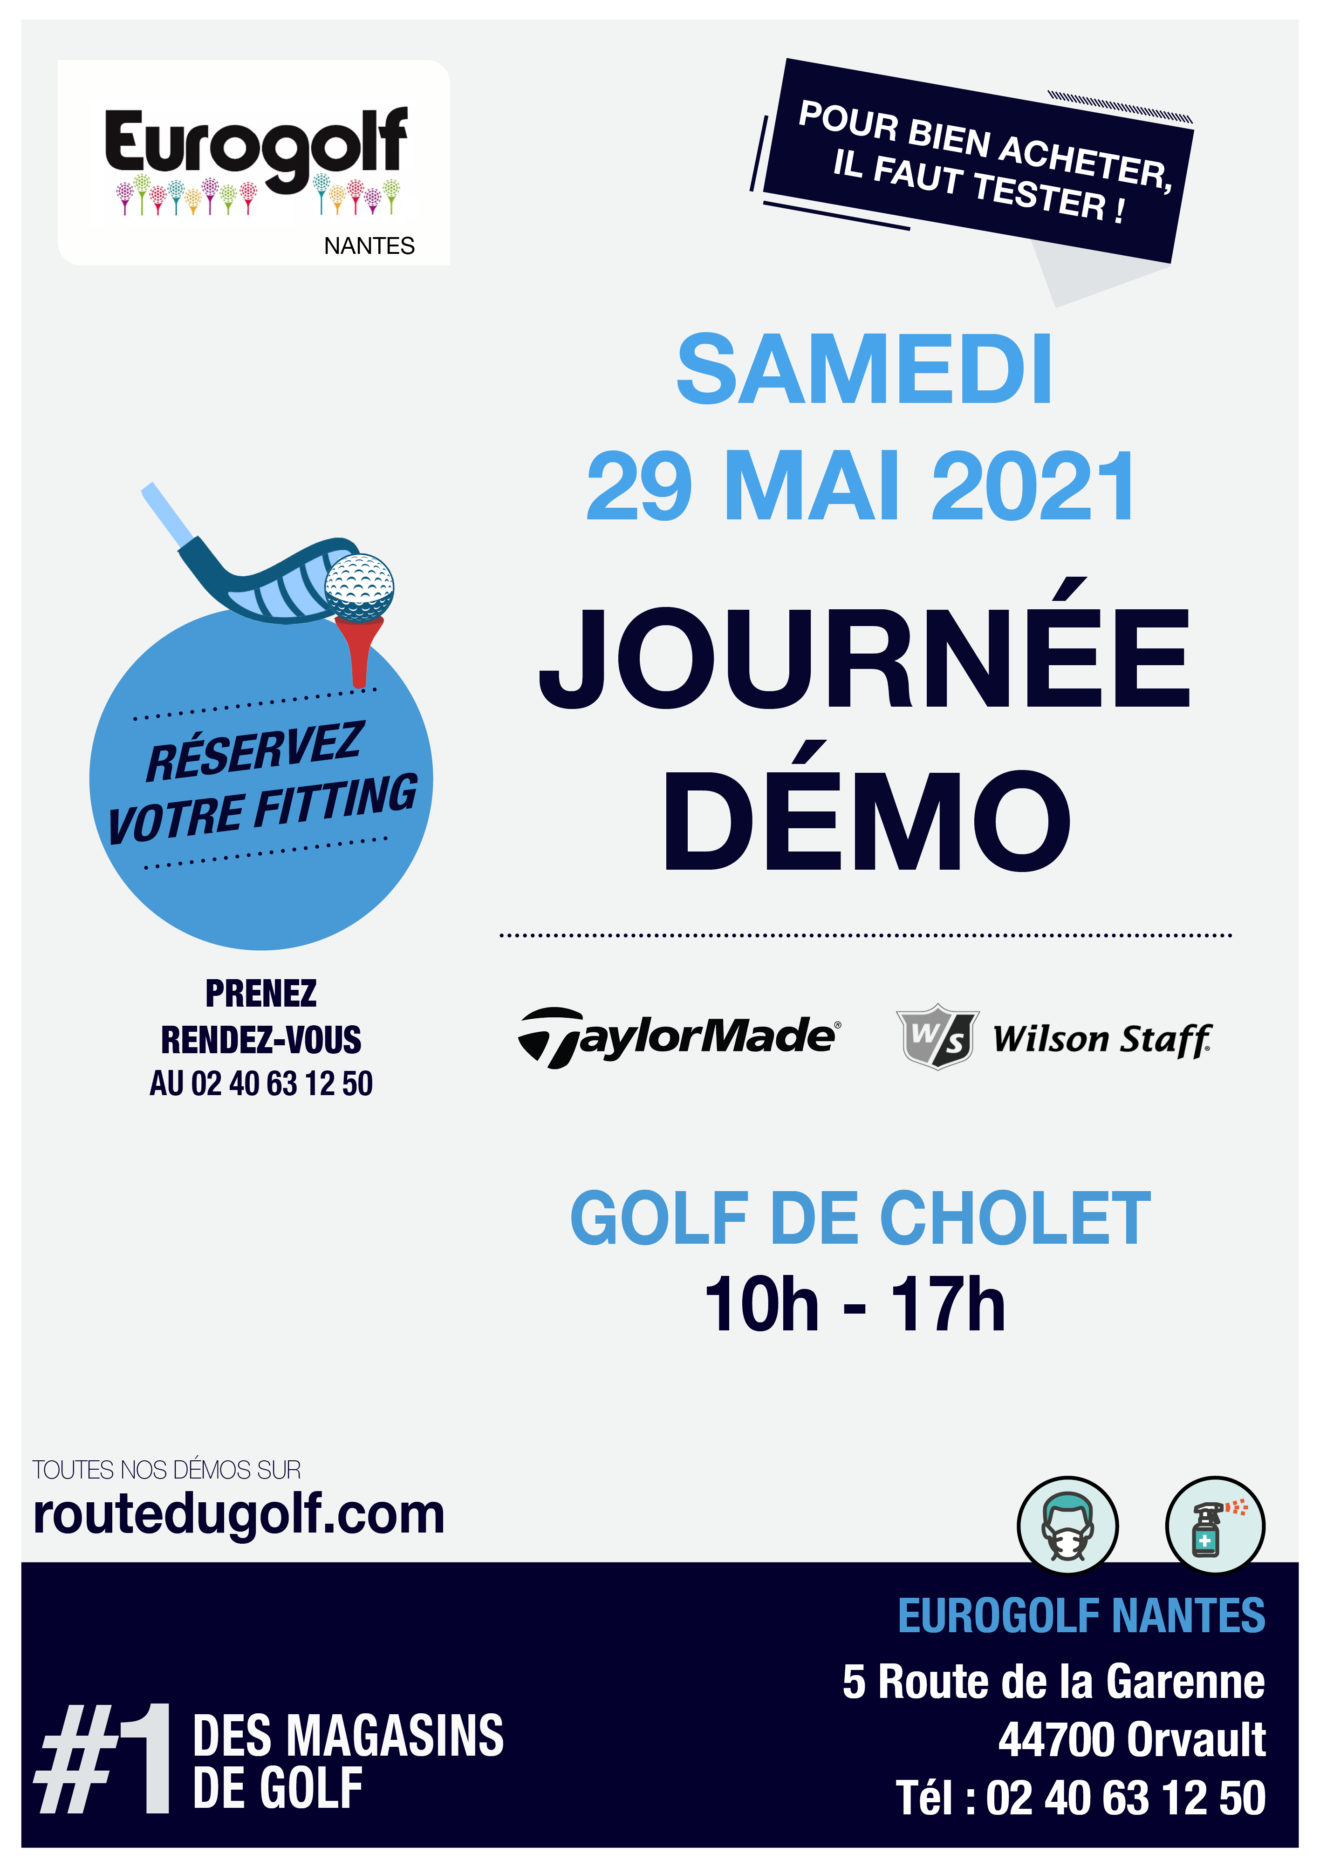 Démo_Nantes_TM&WILSON_29_05